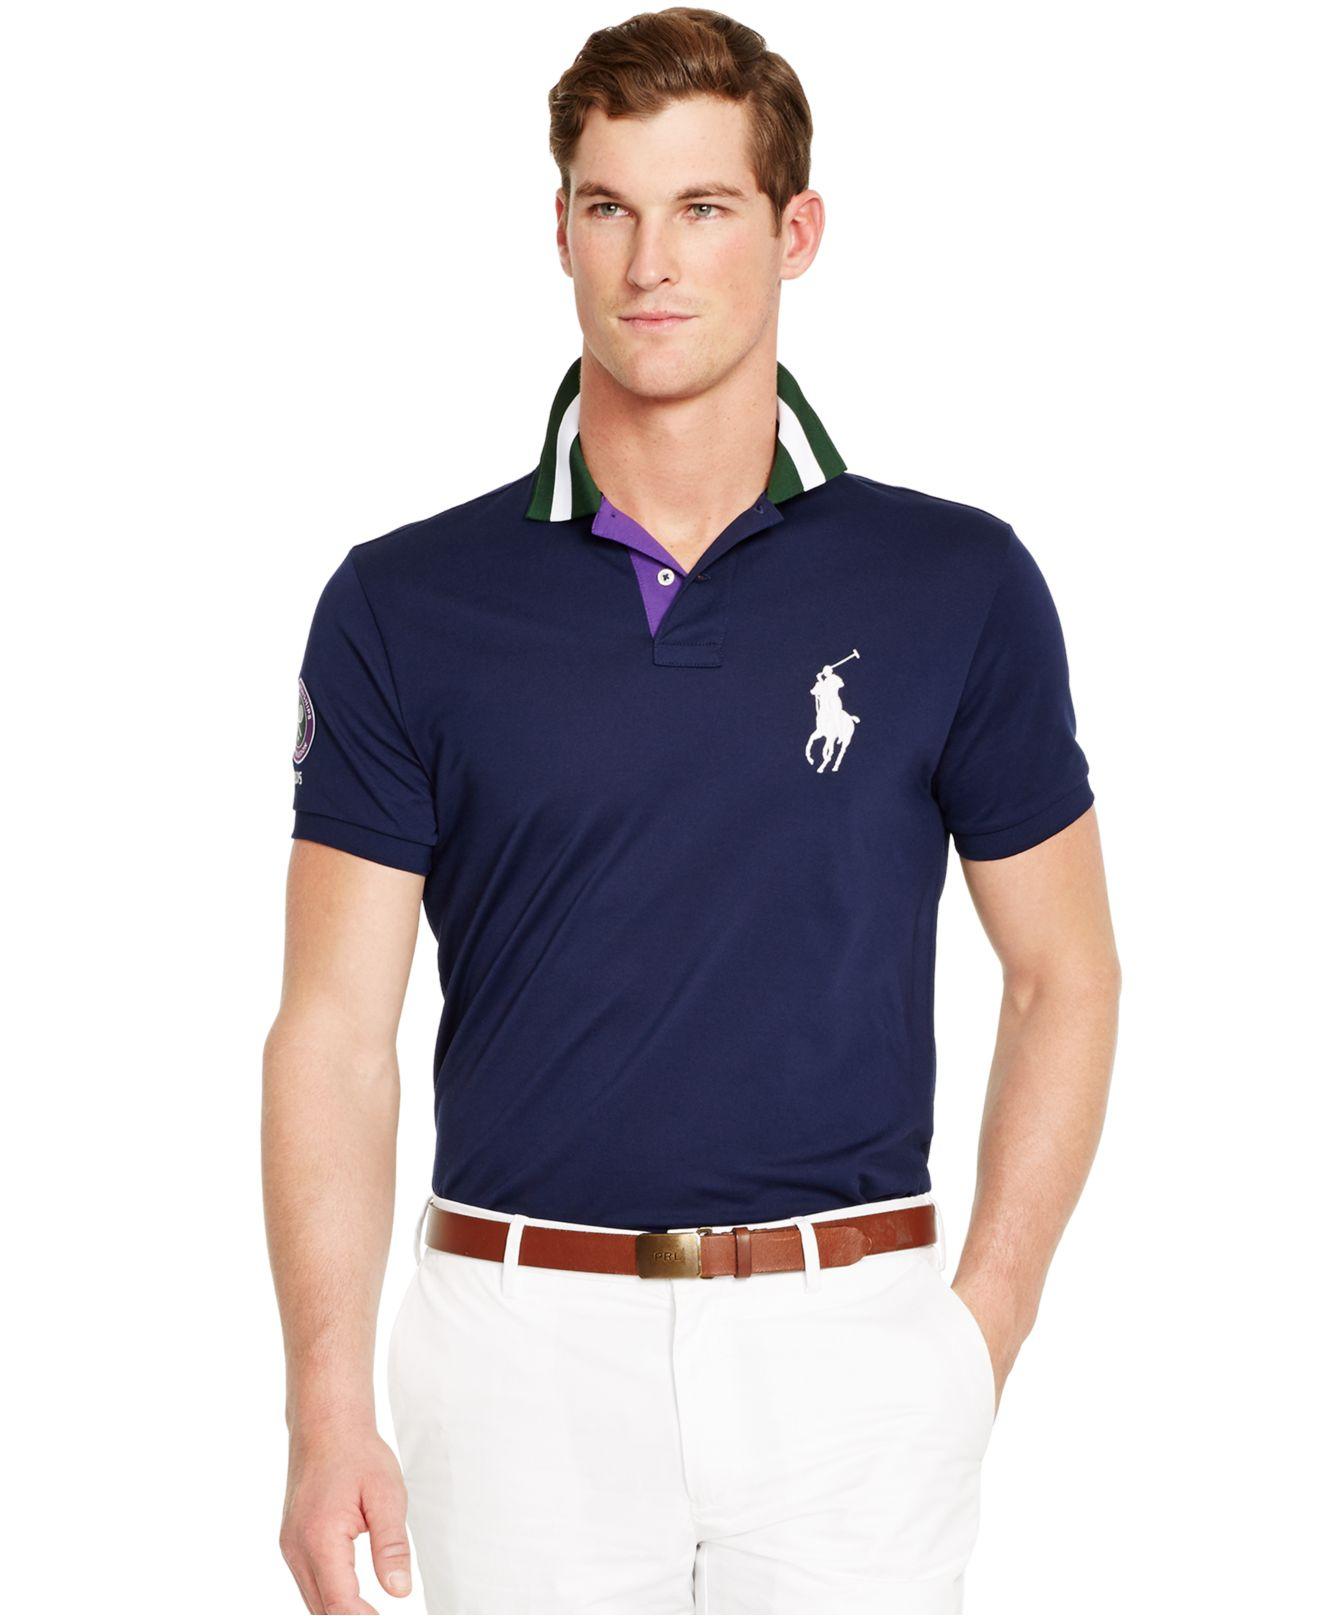 Cheap Polo Shirts For Men